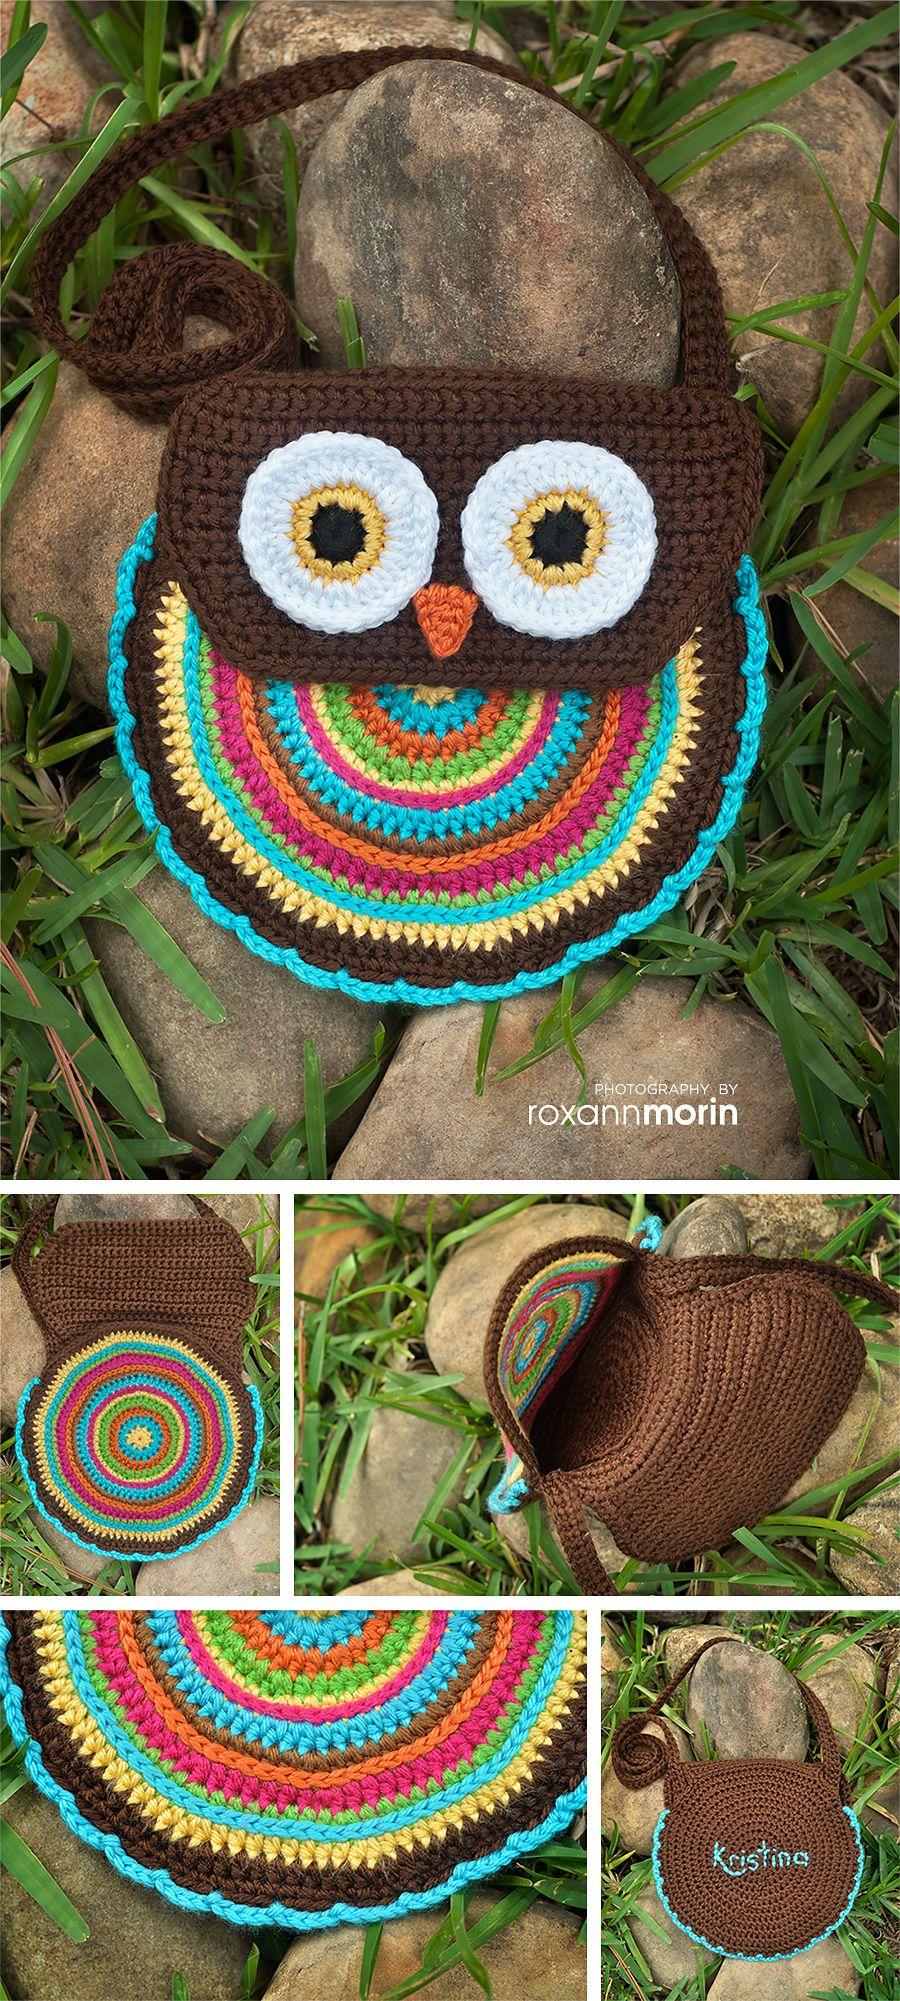 Free Crochet Patterns For Owl Purses : Crochet Pattern - Crochet Owl Purse (Pattern No. 005 ...